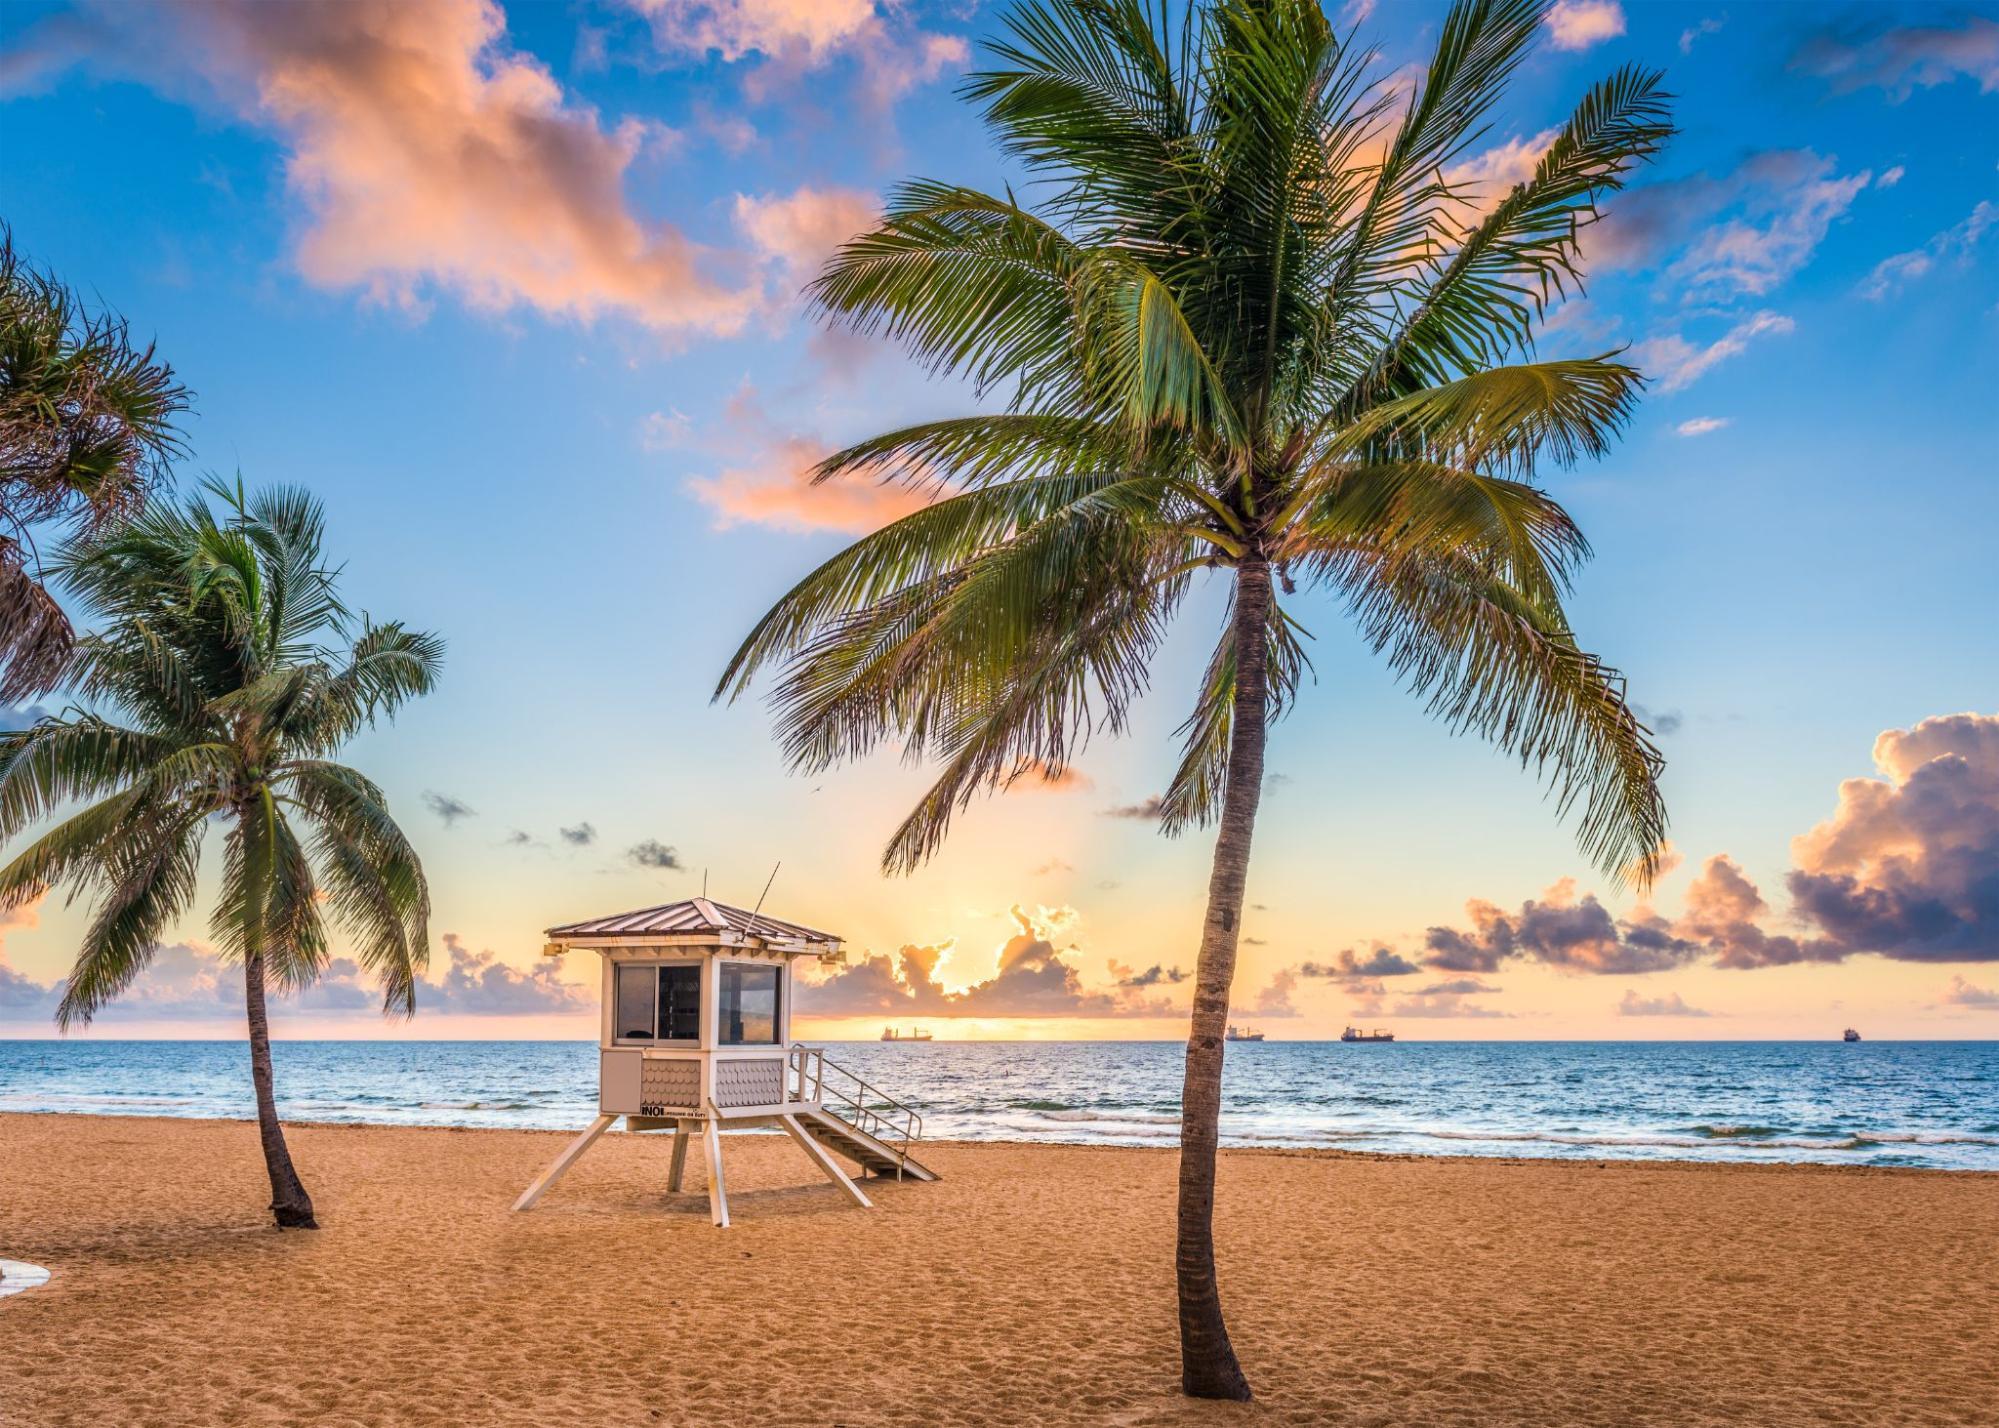 Beautiful beach in Fort Lauderdale, Florida.